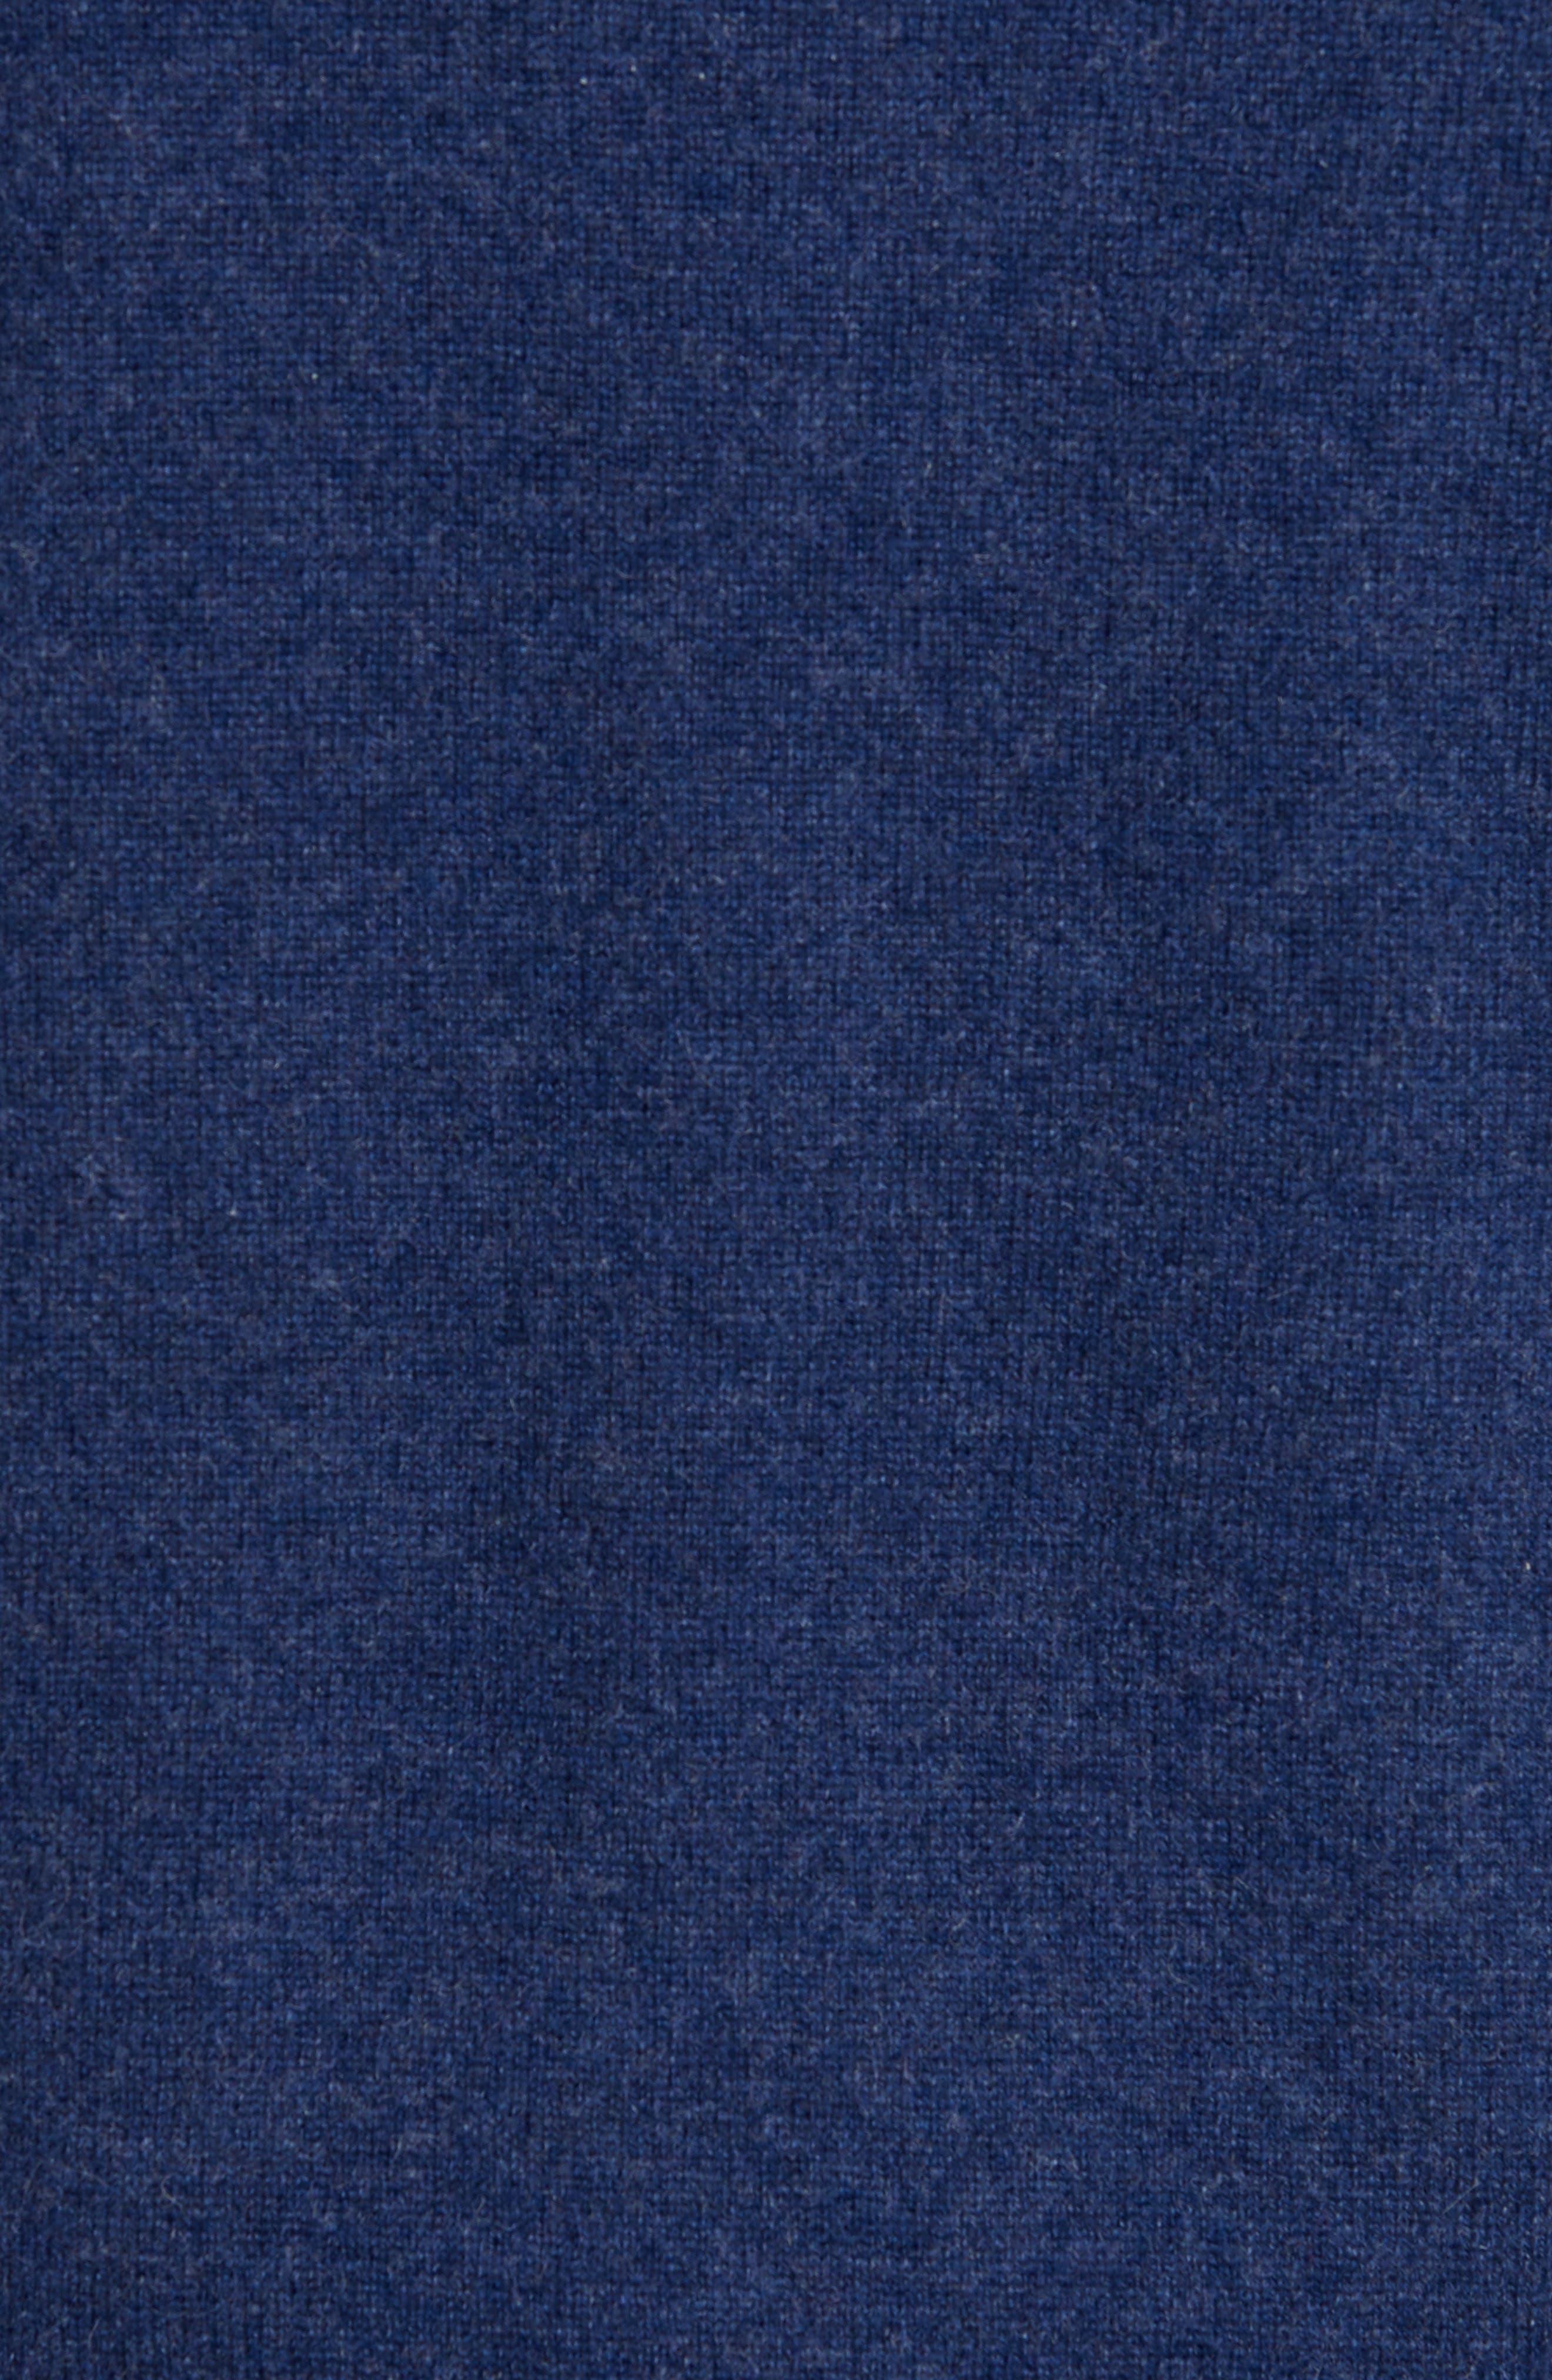 Cashmere V-Neck Sweater Vest,                             Alternate thumbnail 5, color,                             420